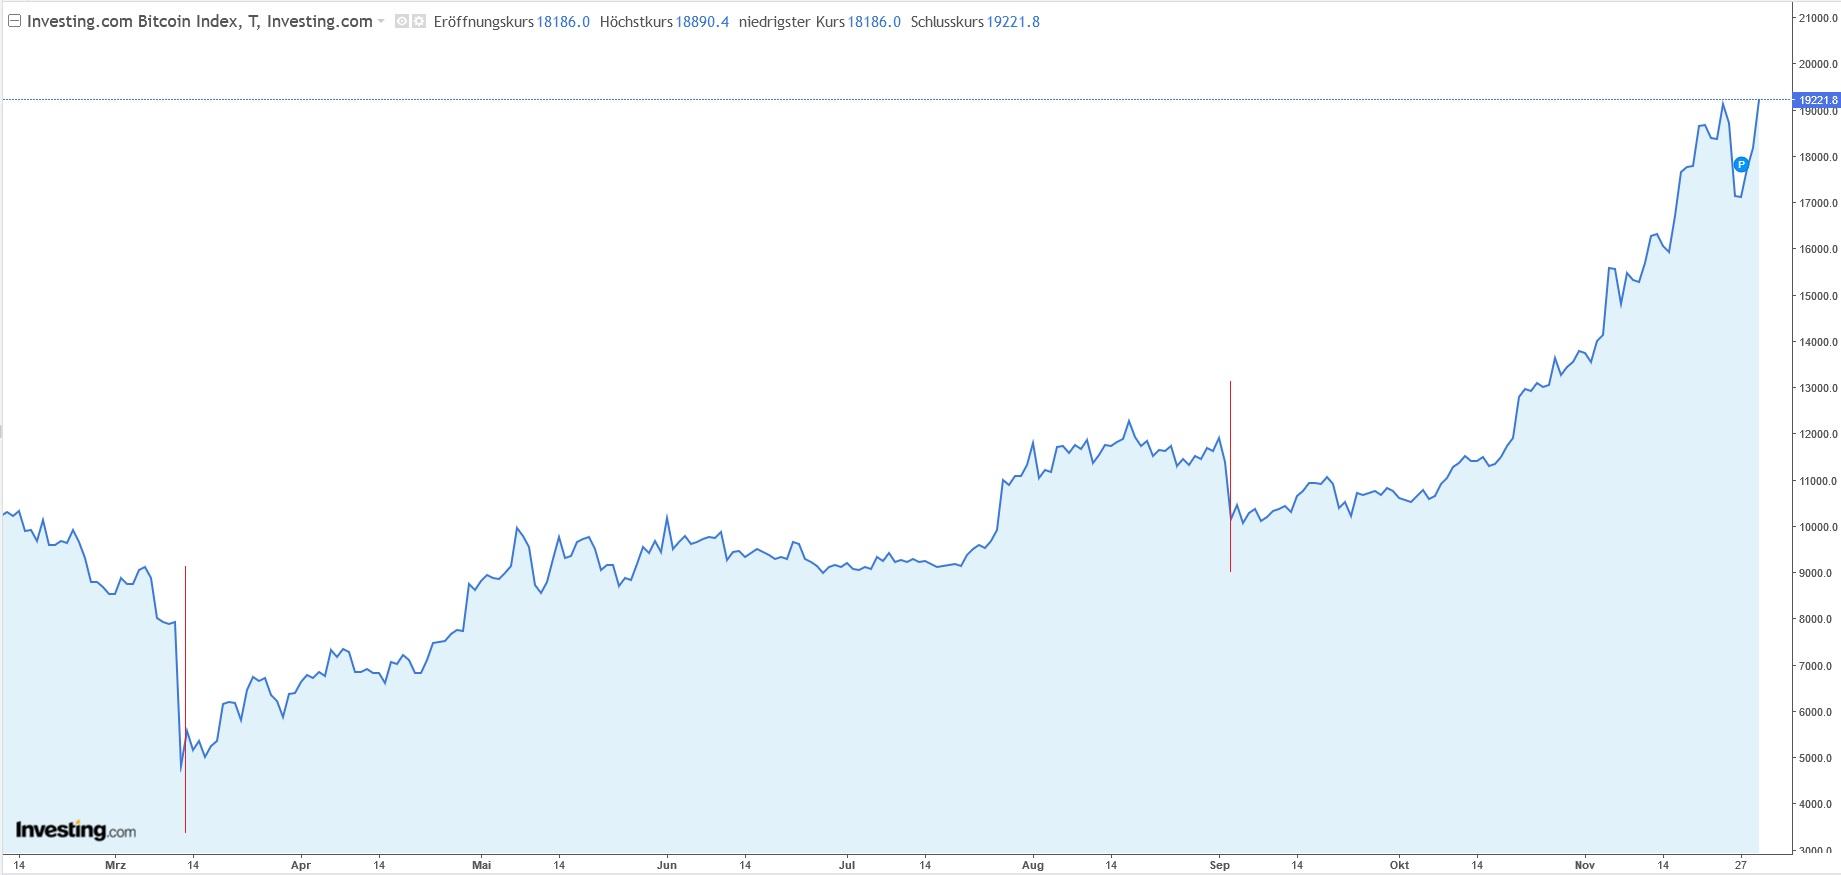 Kursverlauf und Bull-Run Kryptowährung Bitcoin